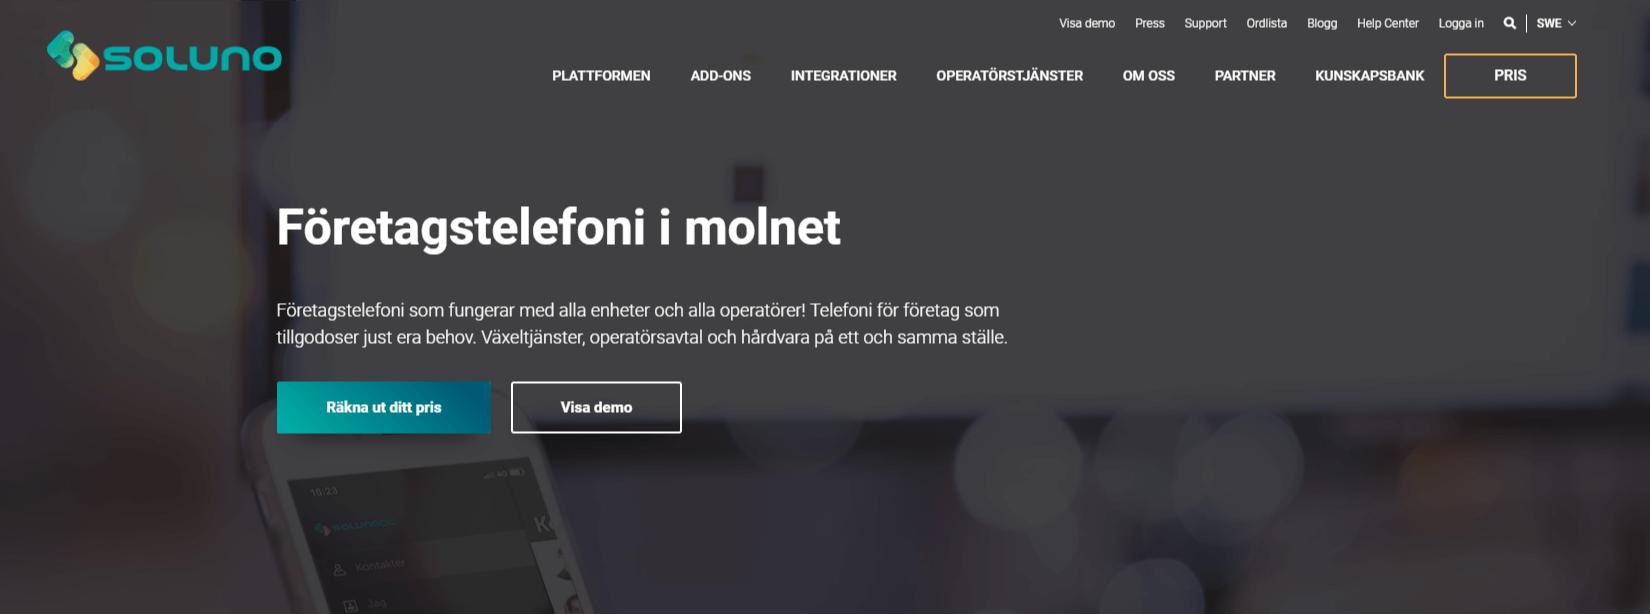 Soluno-telefonileverantör-homepage